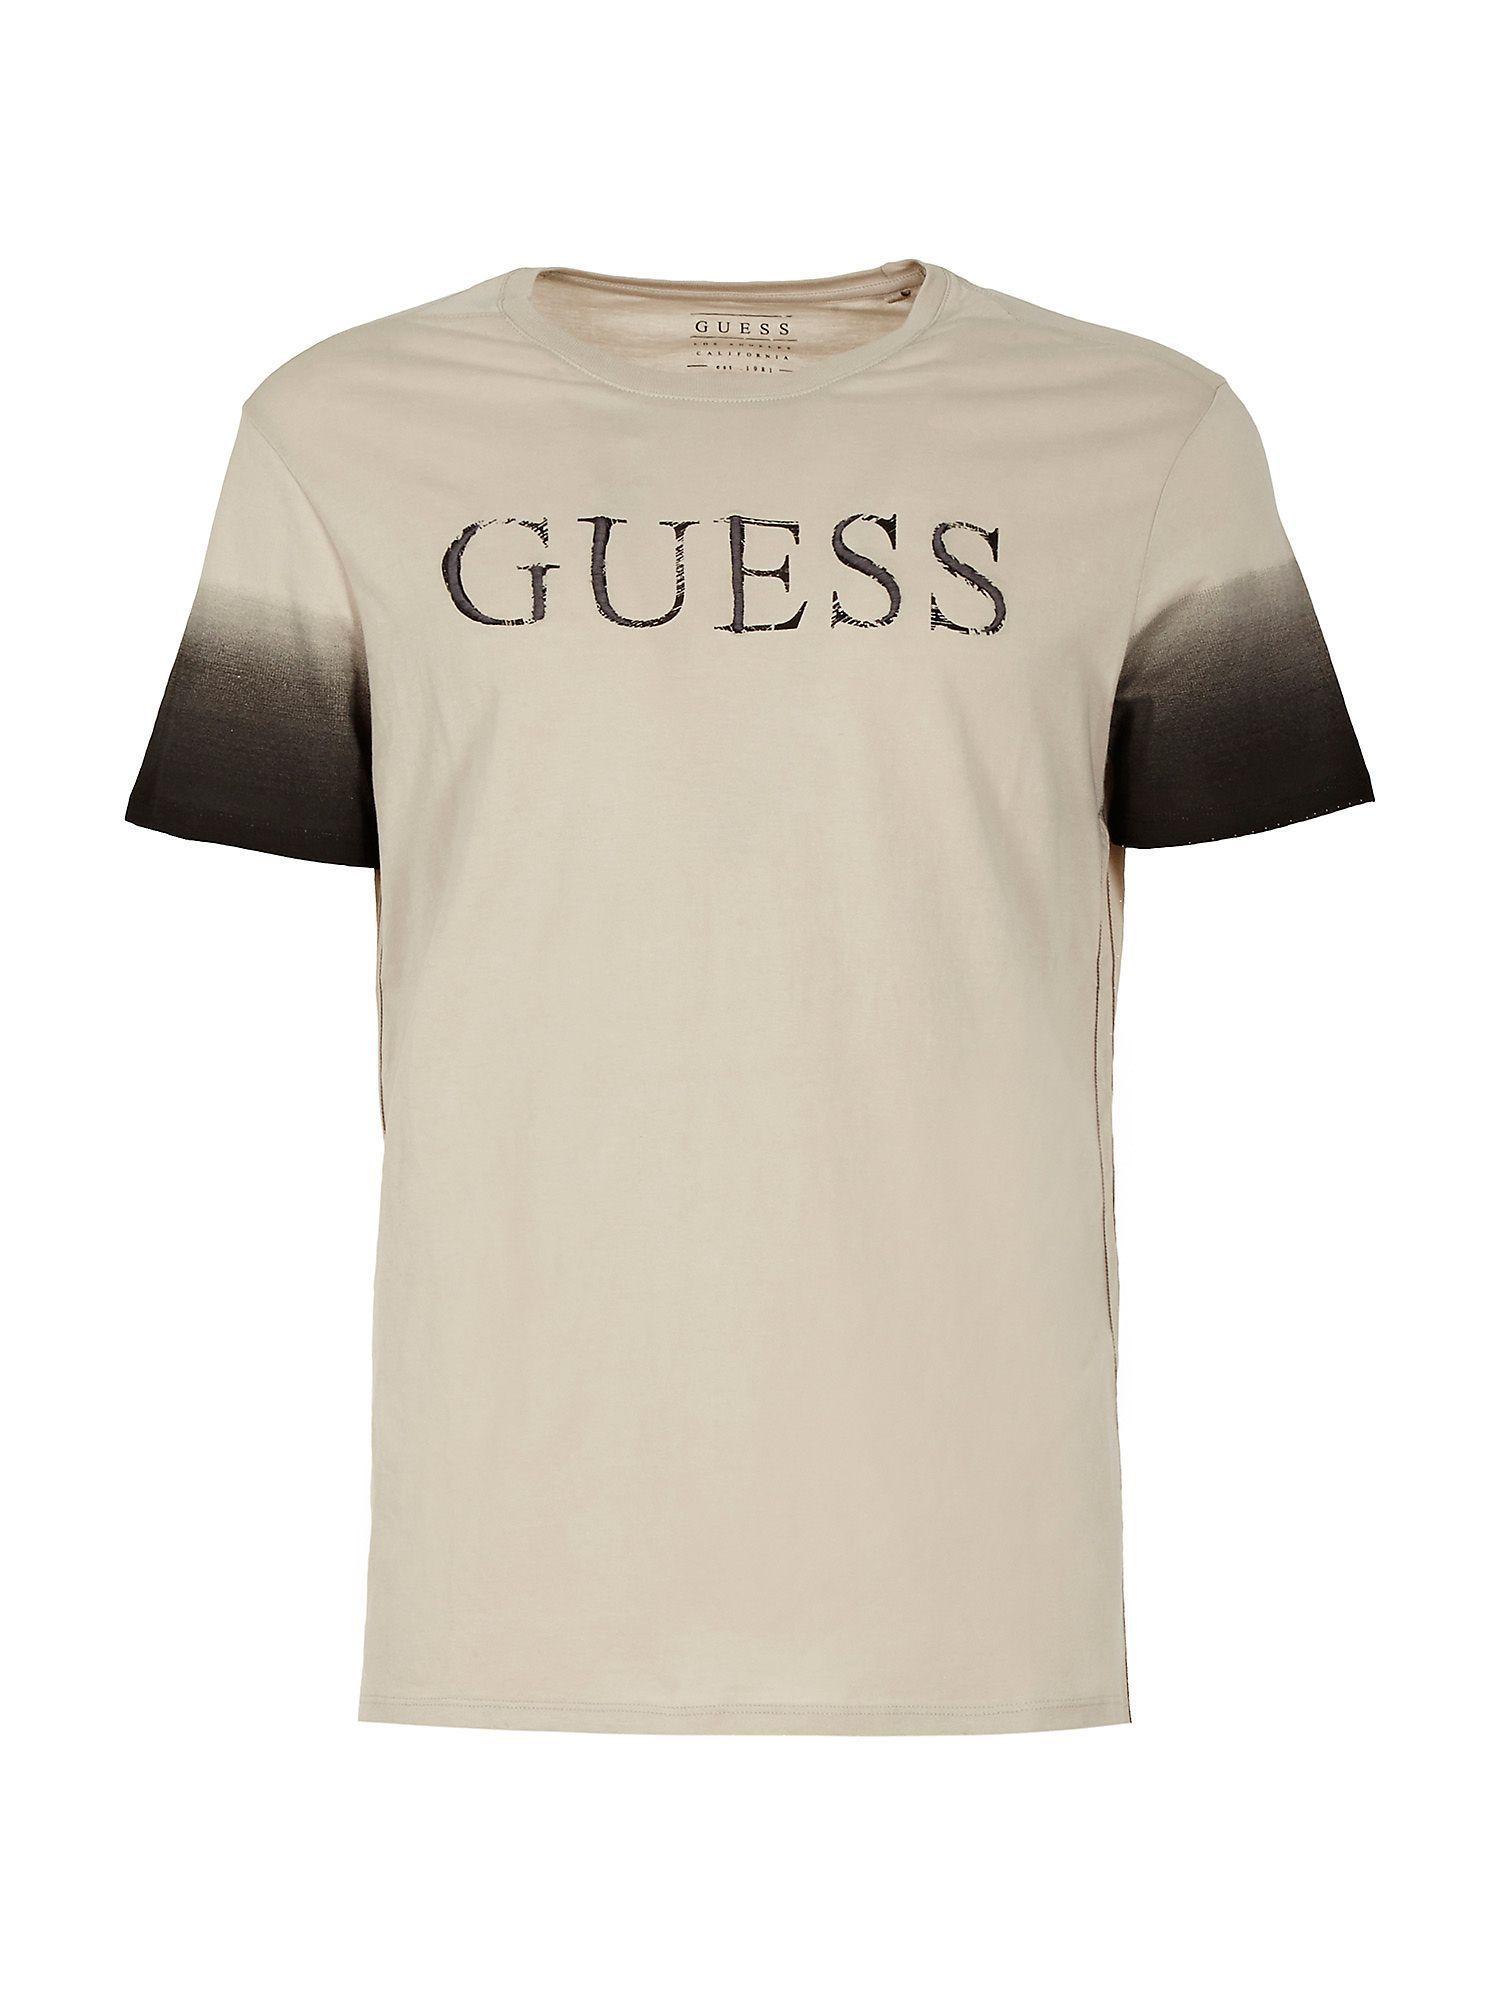 a4c5eac67ca20 Camisetas para hombre